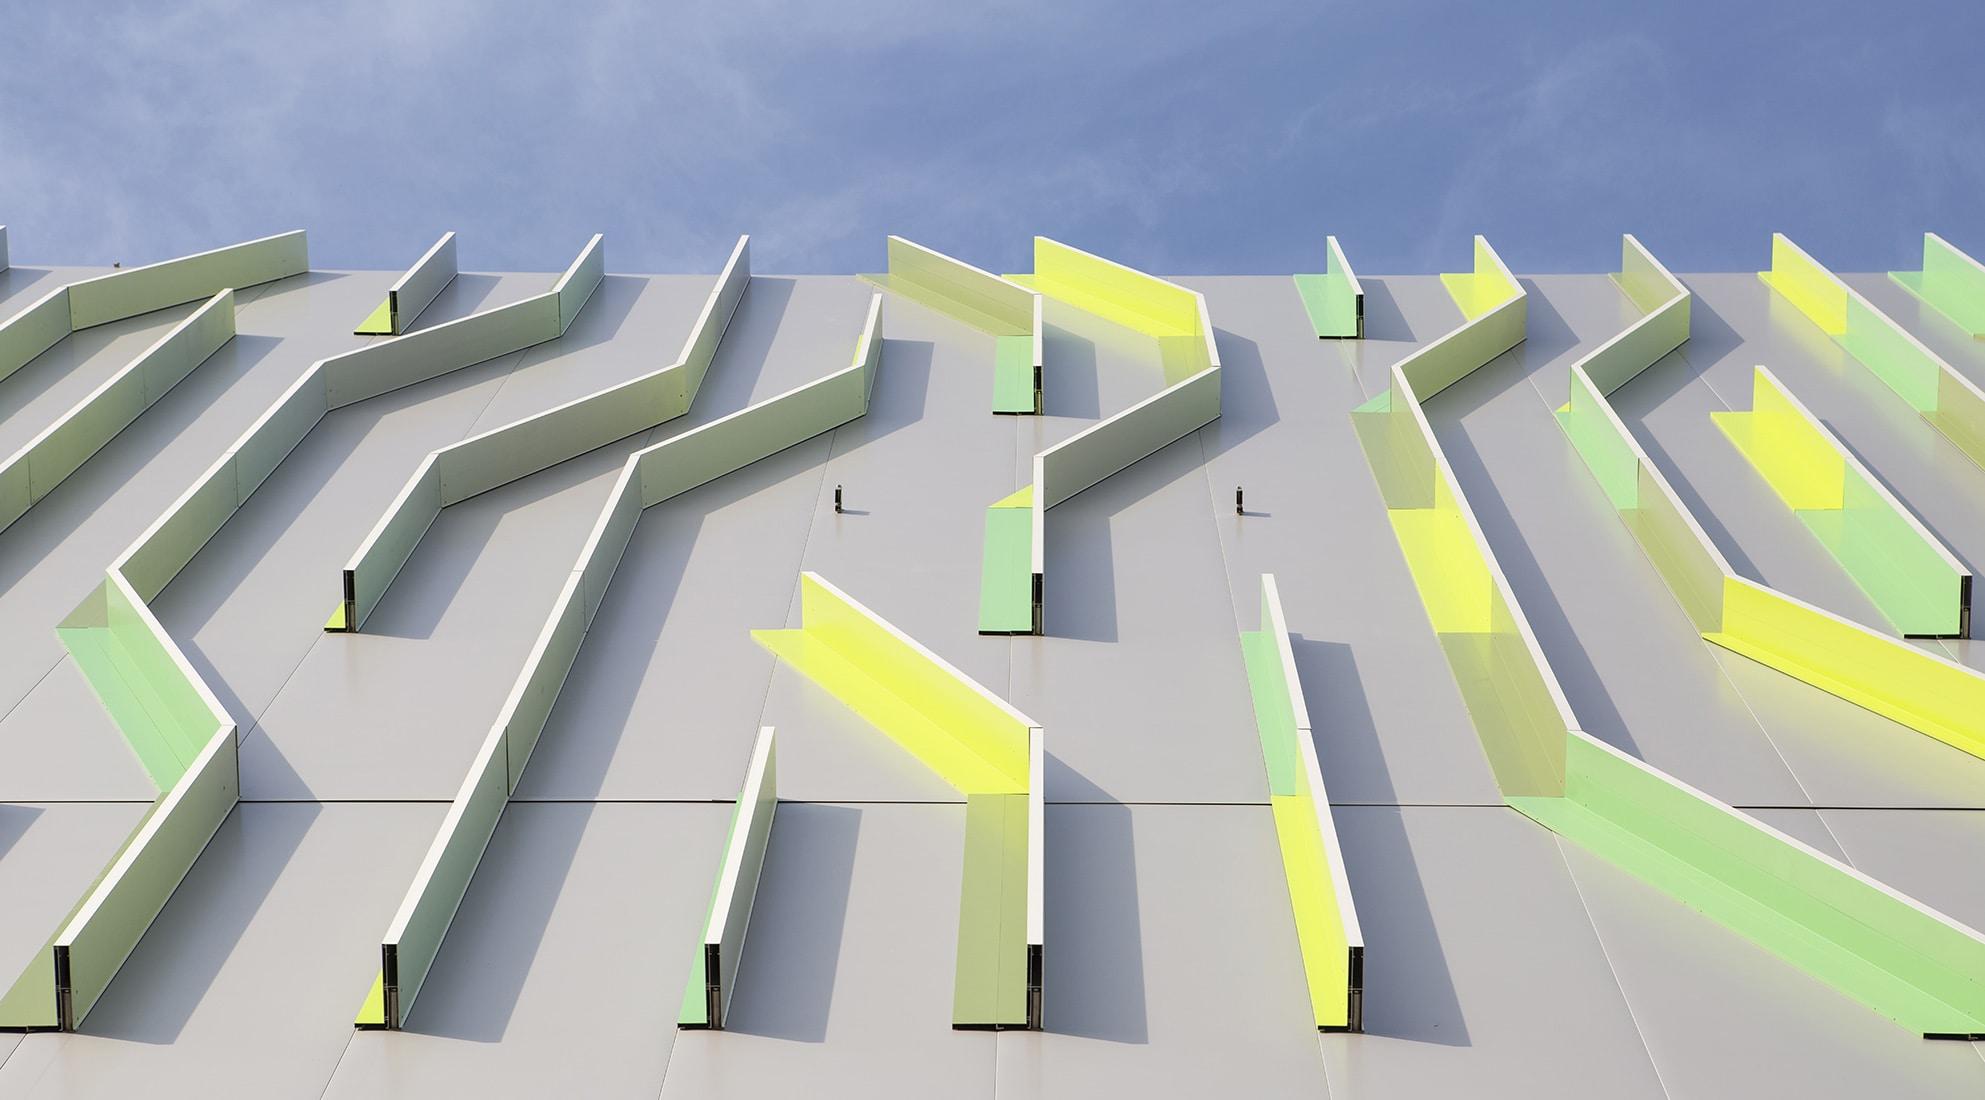 Architettura industriale 3.0